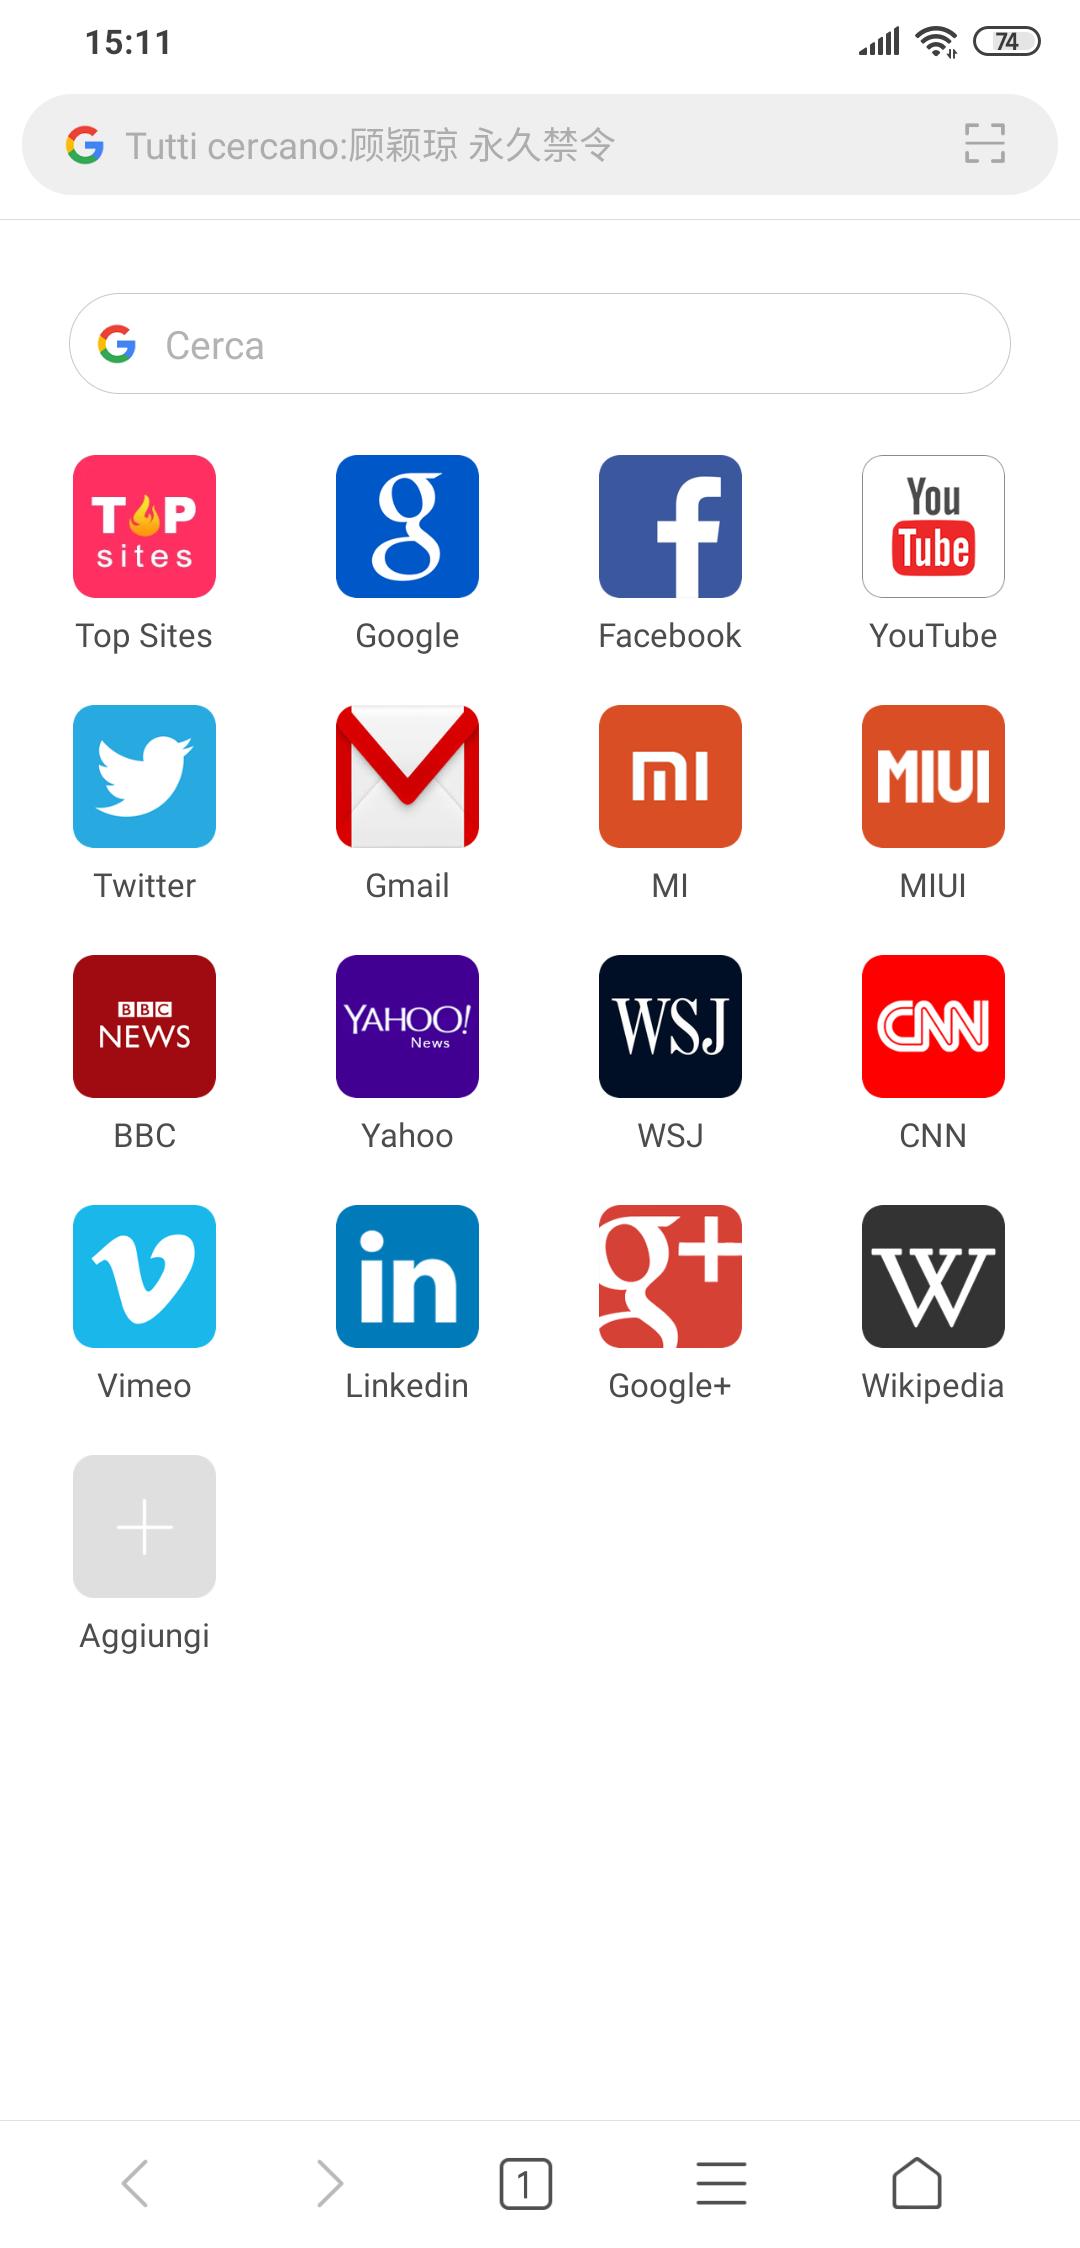 Screenshot_2018-10-29-15-11-41-697_com.android.browser.png